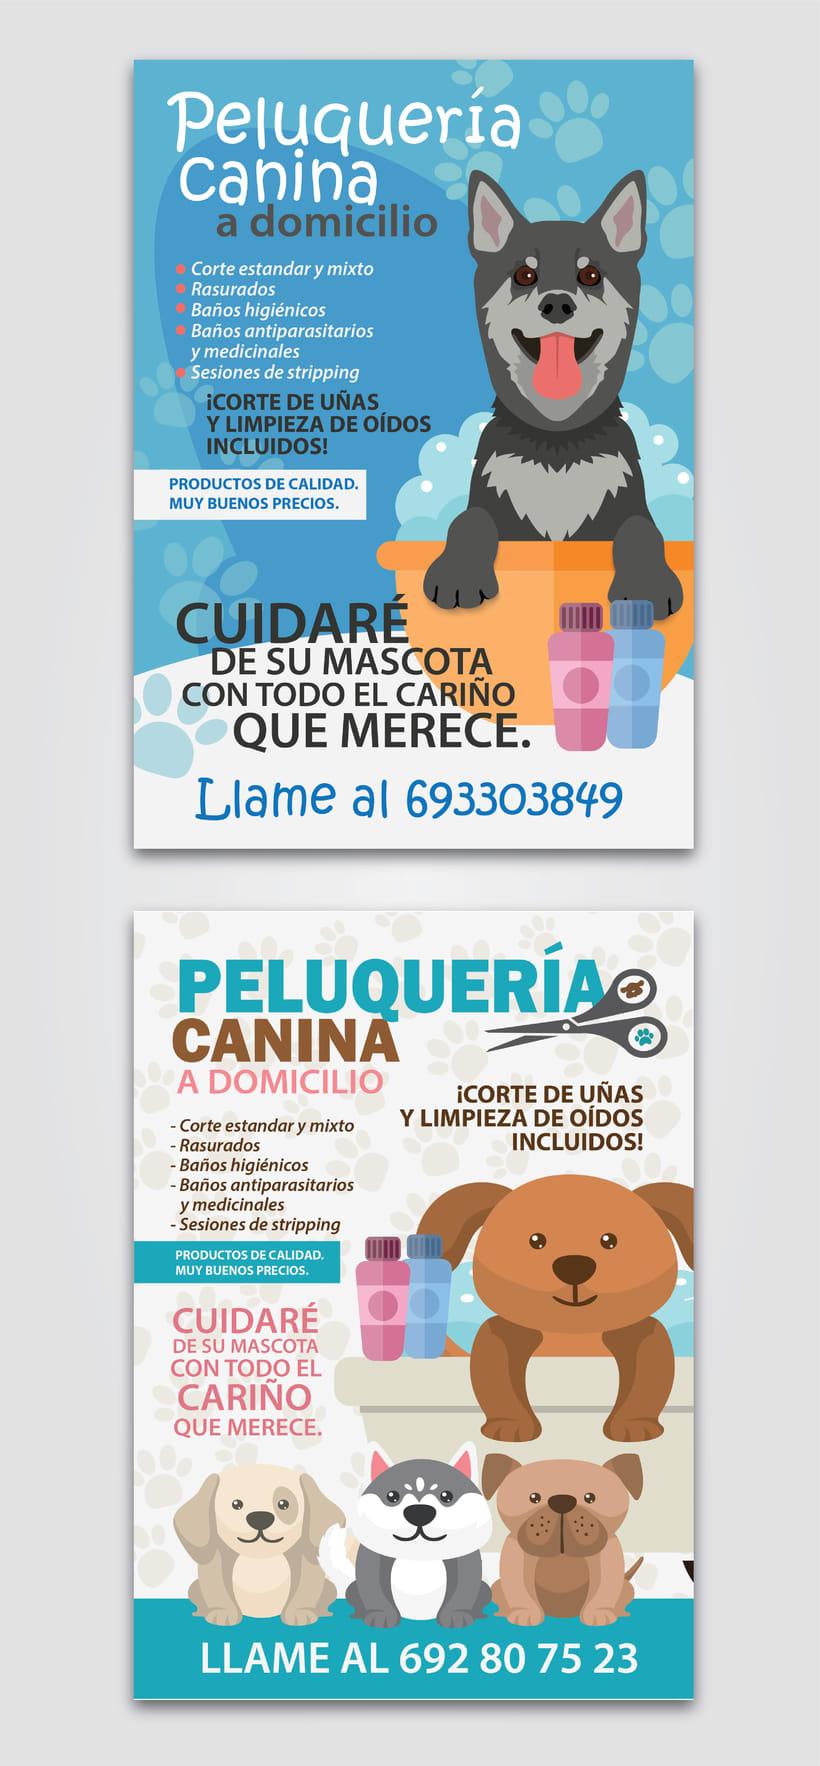 [FLYERS] Peluquería Canina -1